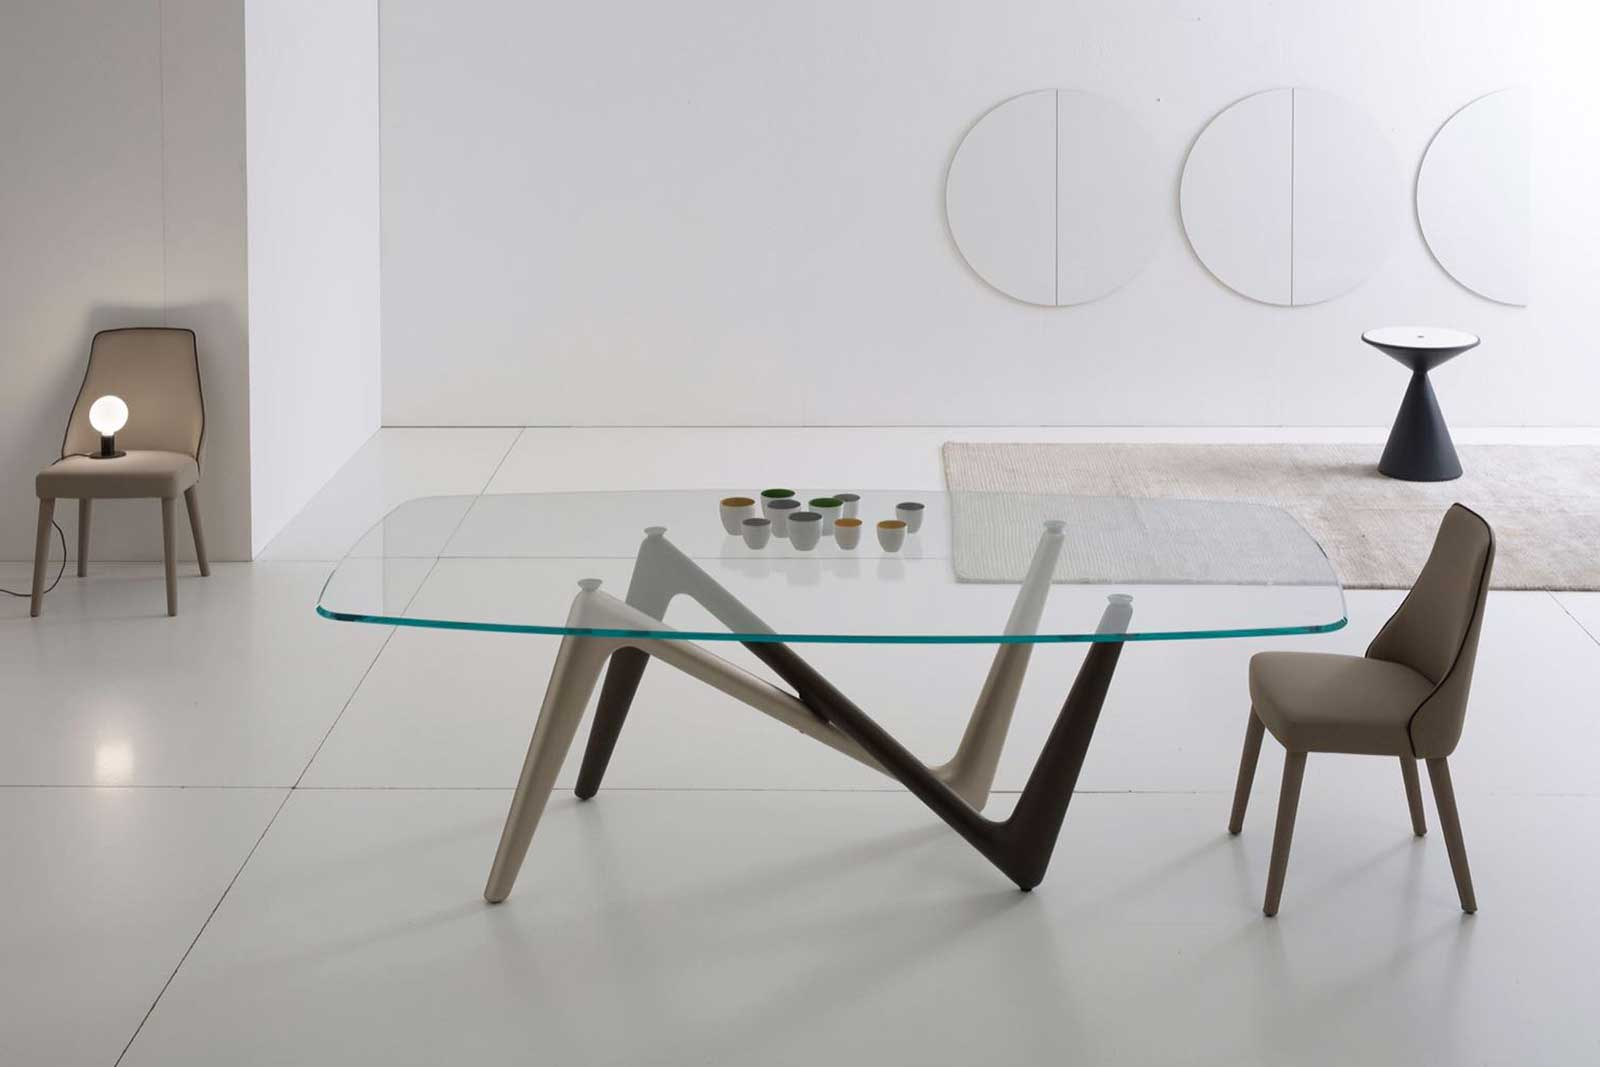 Edge tavolo rettangolare bronzo titanio italy dream design for Tavolo rettangolare design